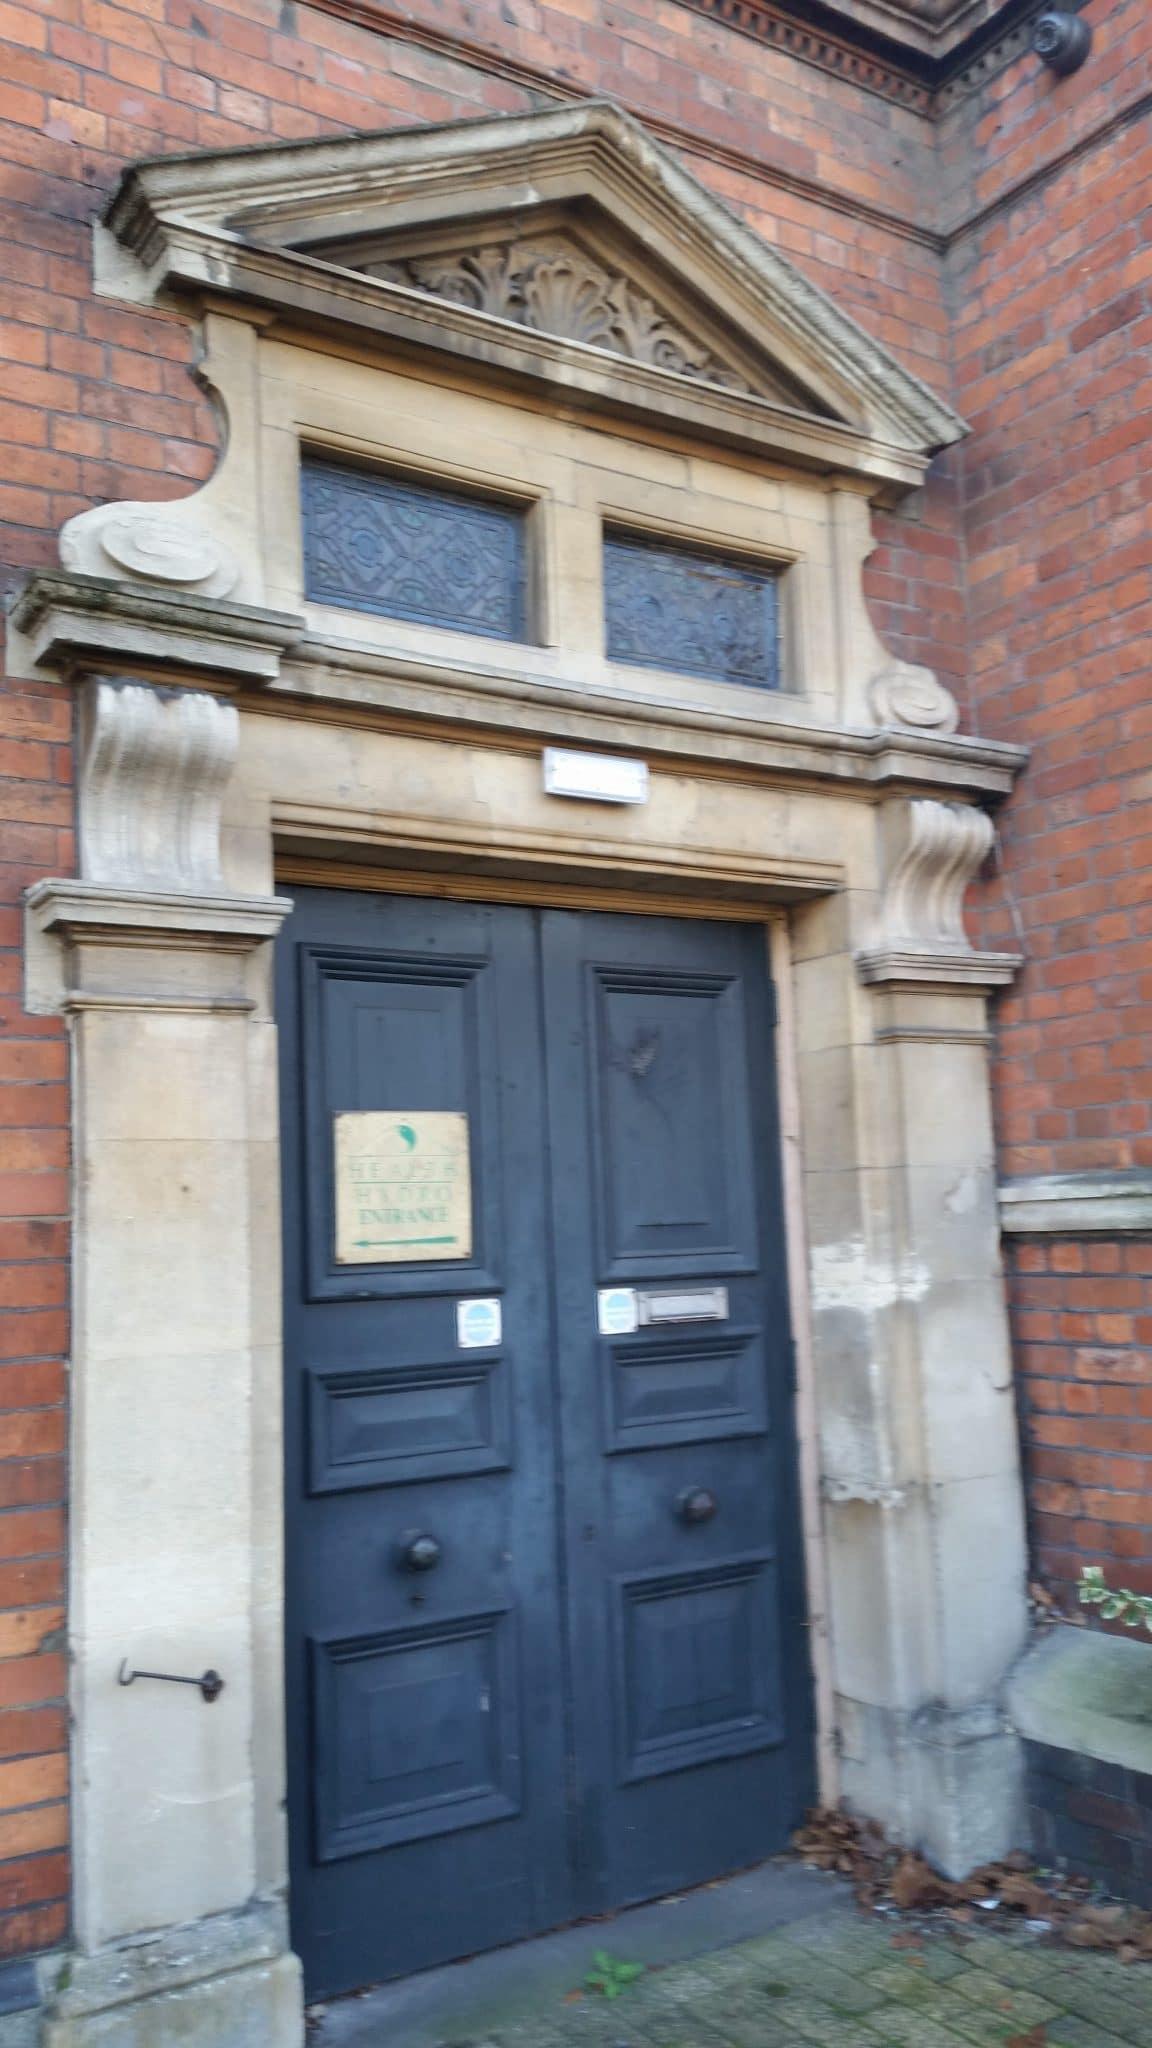 Doorway health hydro swindon